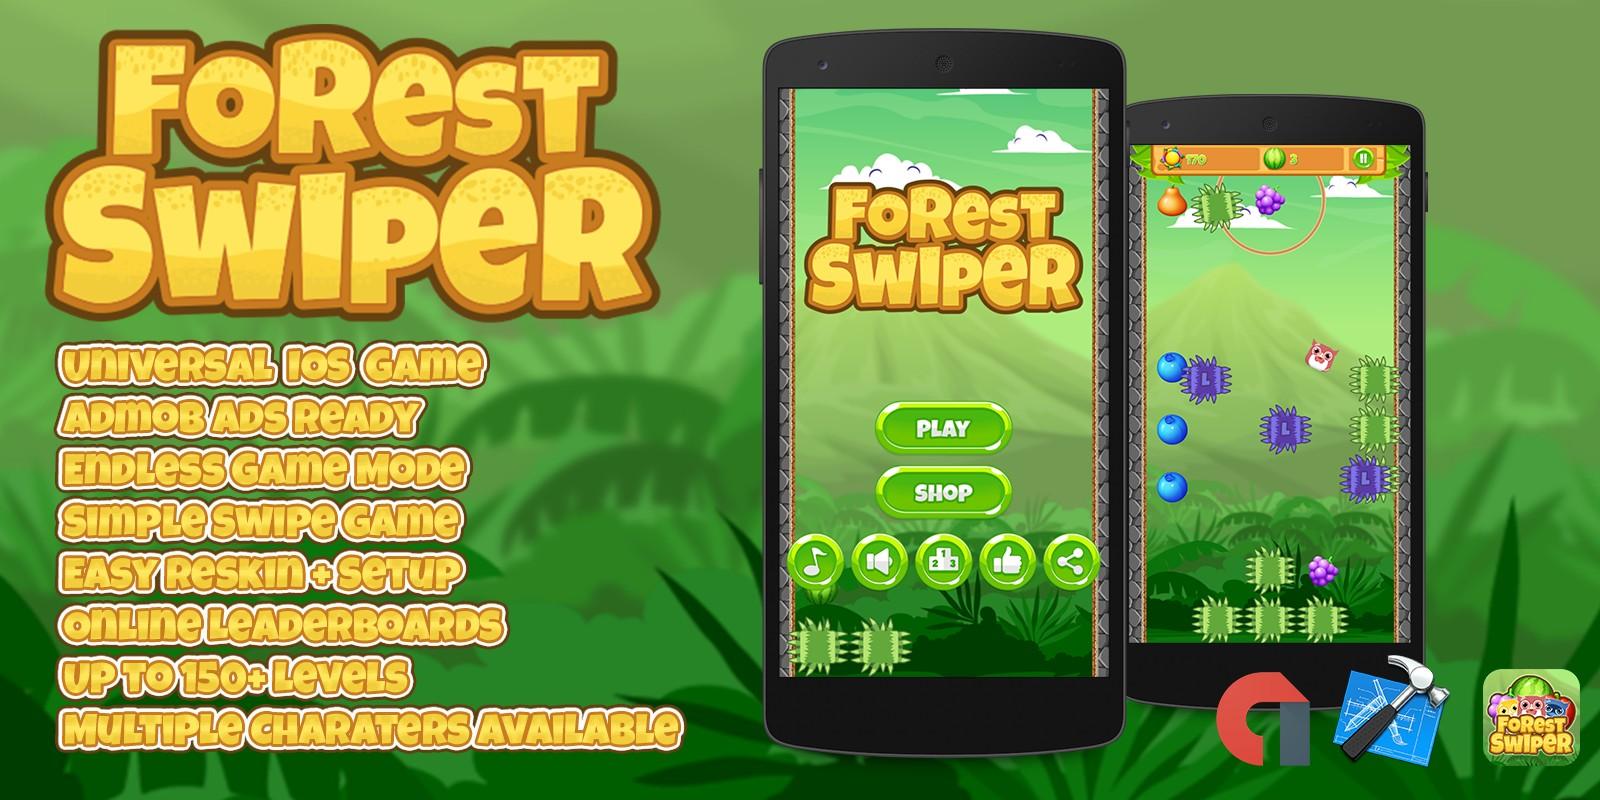 Forest Swiper - iOS Xcode Source Code